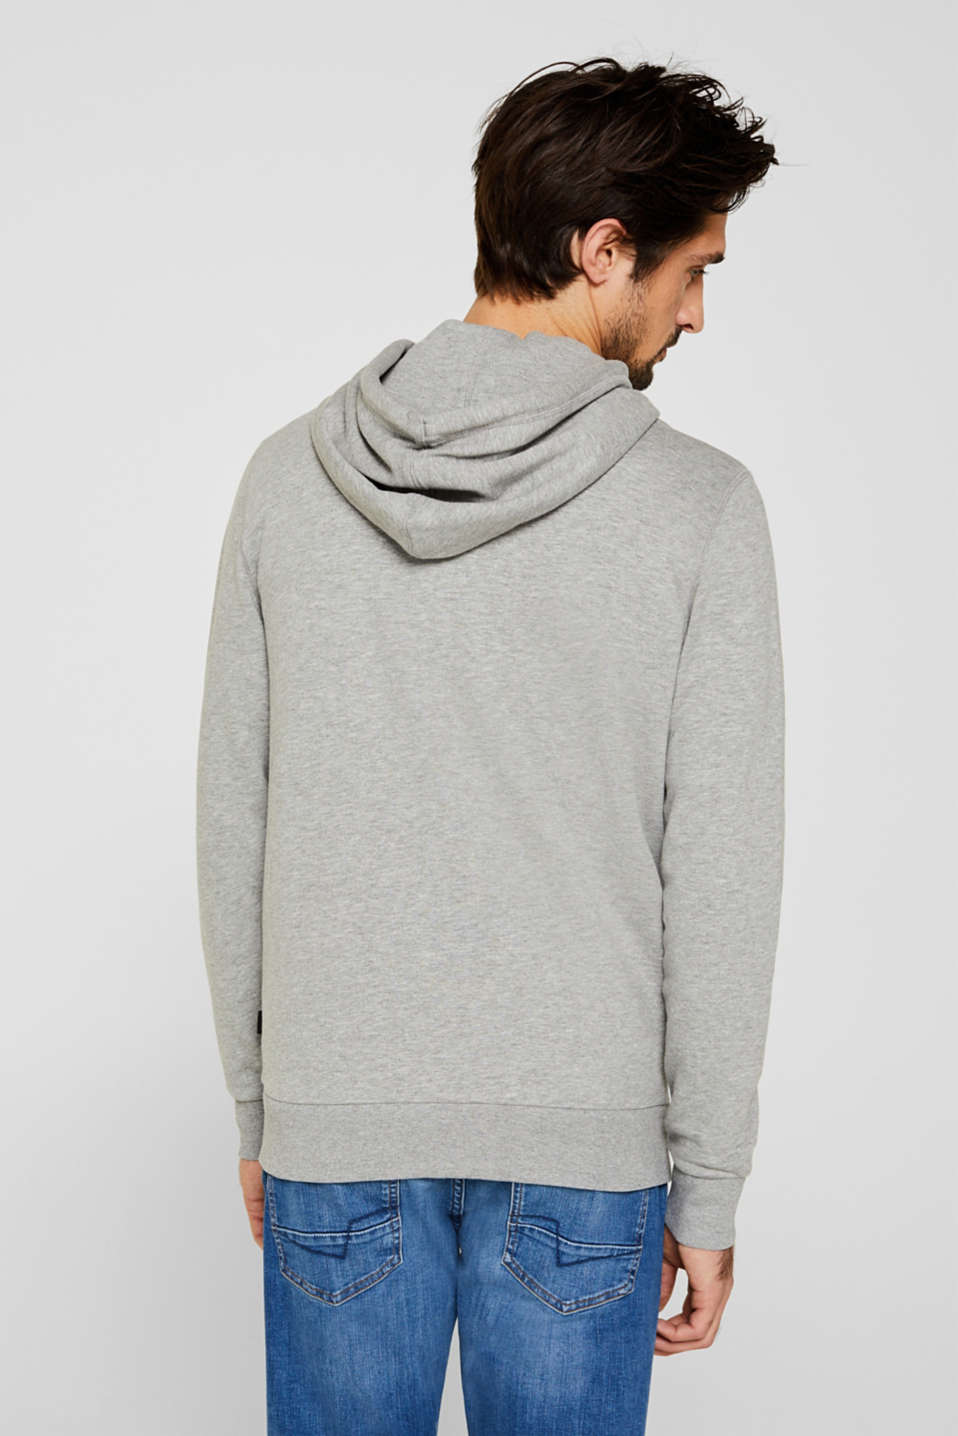 Hooded sweatshirt cardigan, MEDIUM GREY 5, detail image number 3